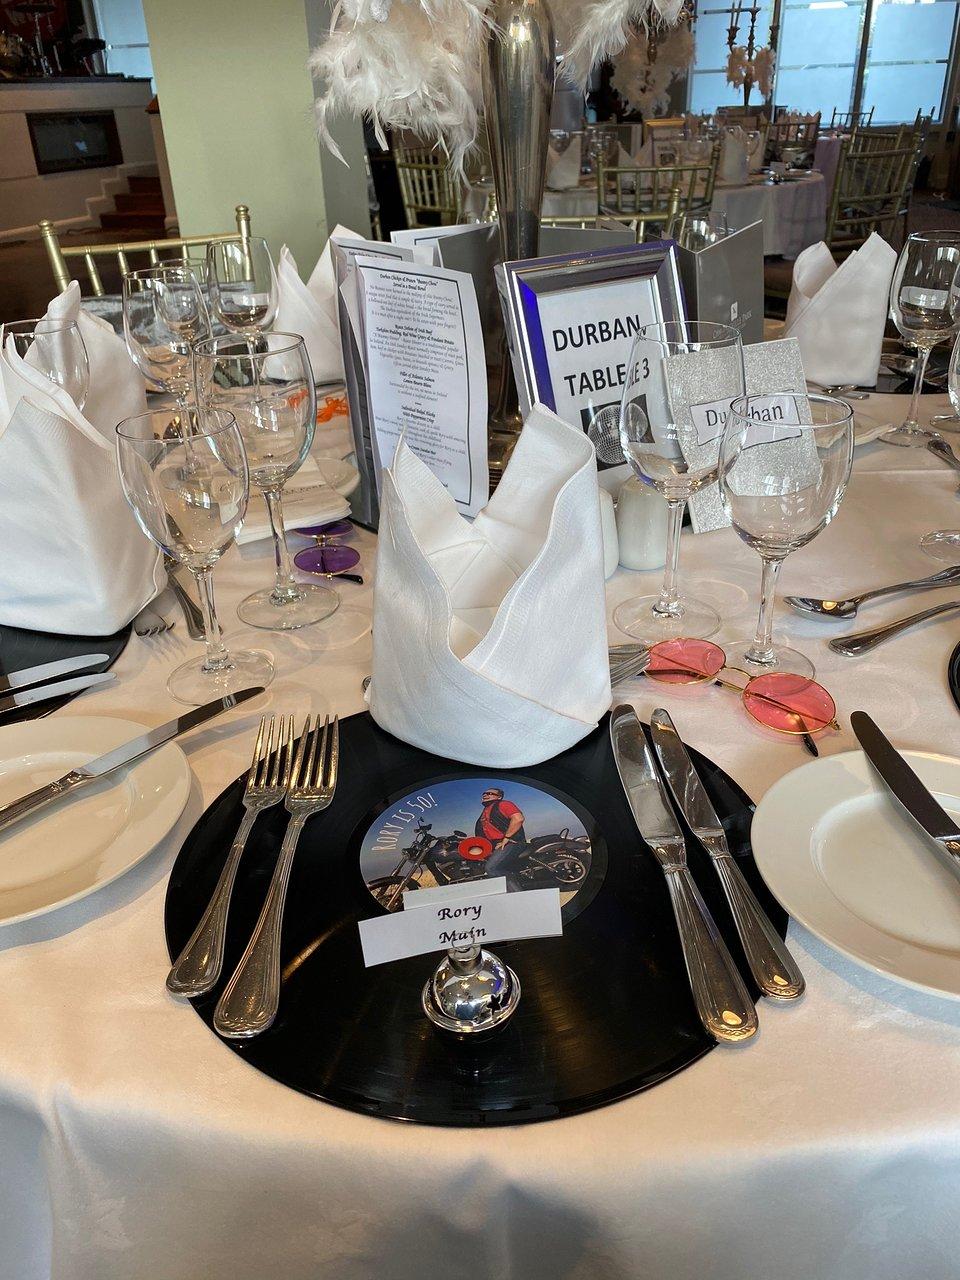 Steak Speed Special - Traveller Reviews - corbett court